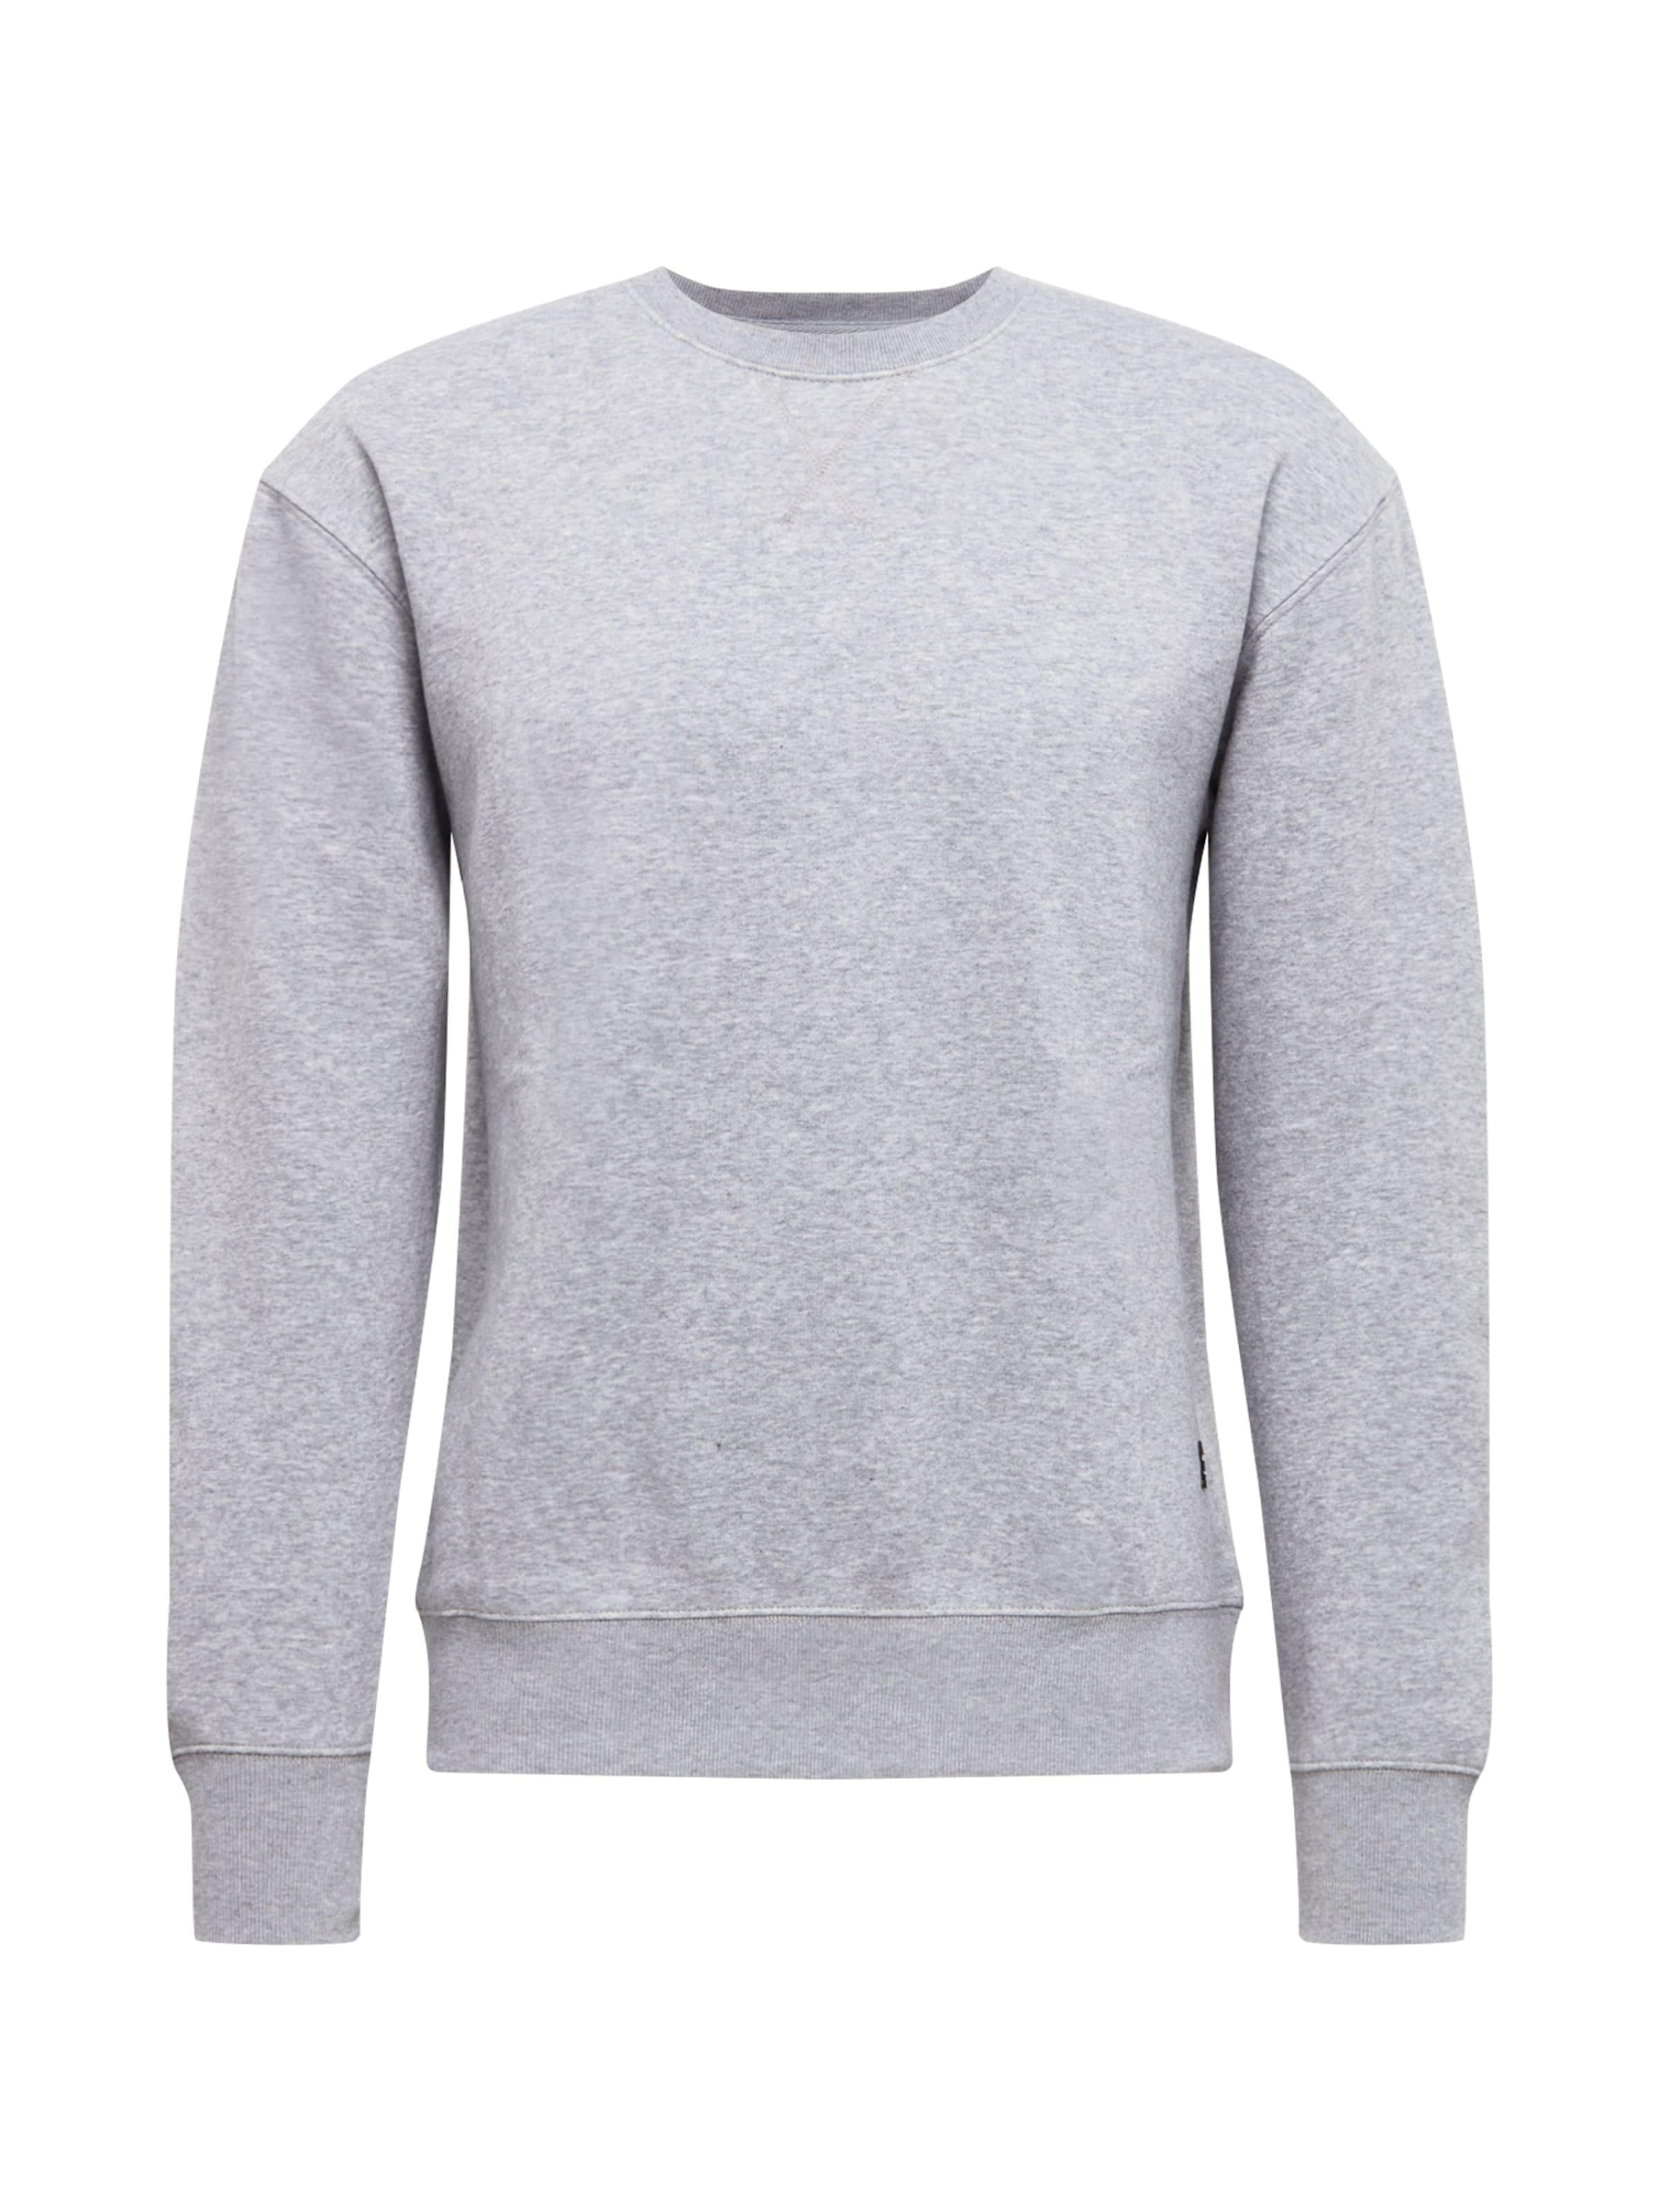 Jones Sweat Foncé En 'soft' shirt Gris Jackamp; YbD9eWEH2I